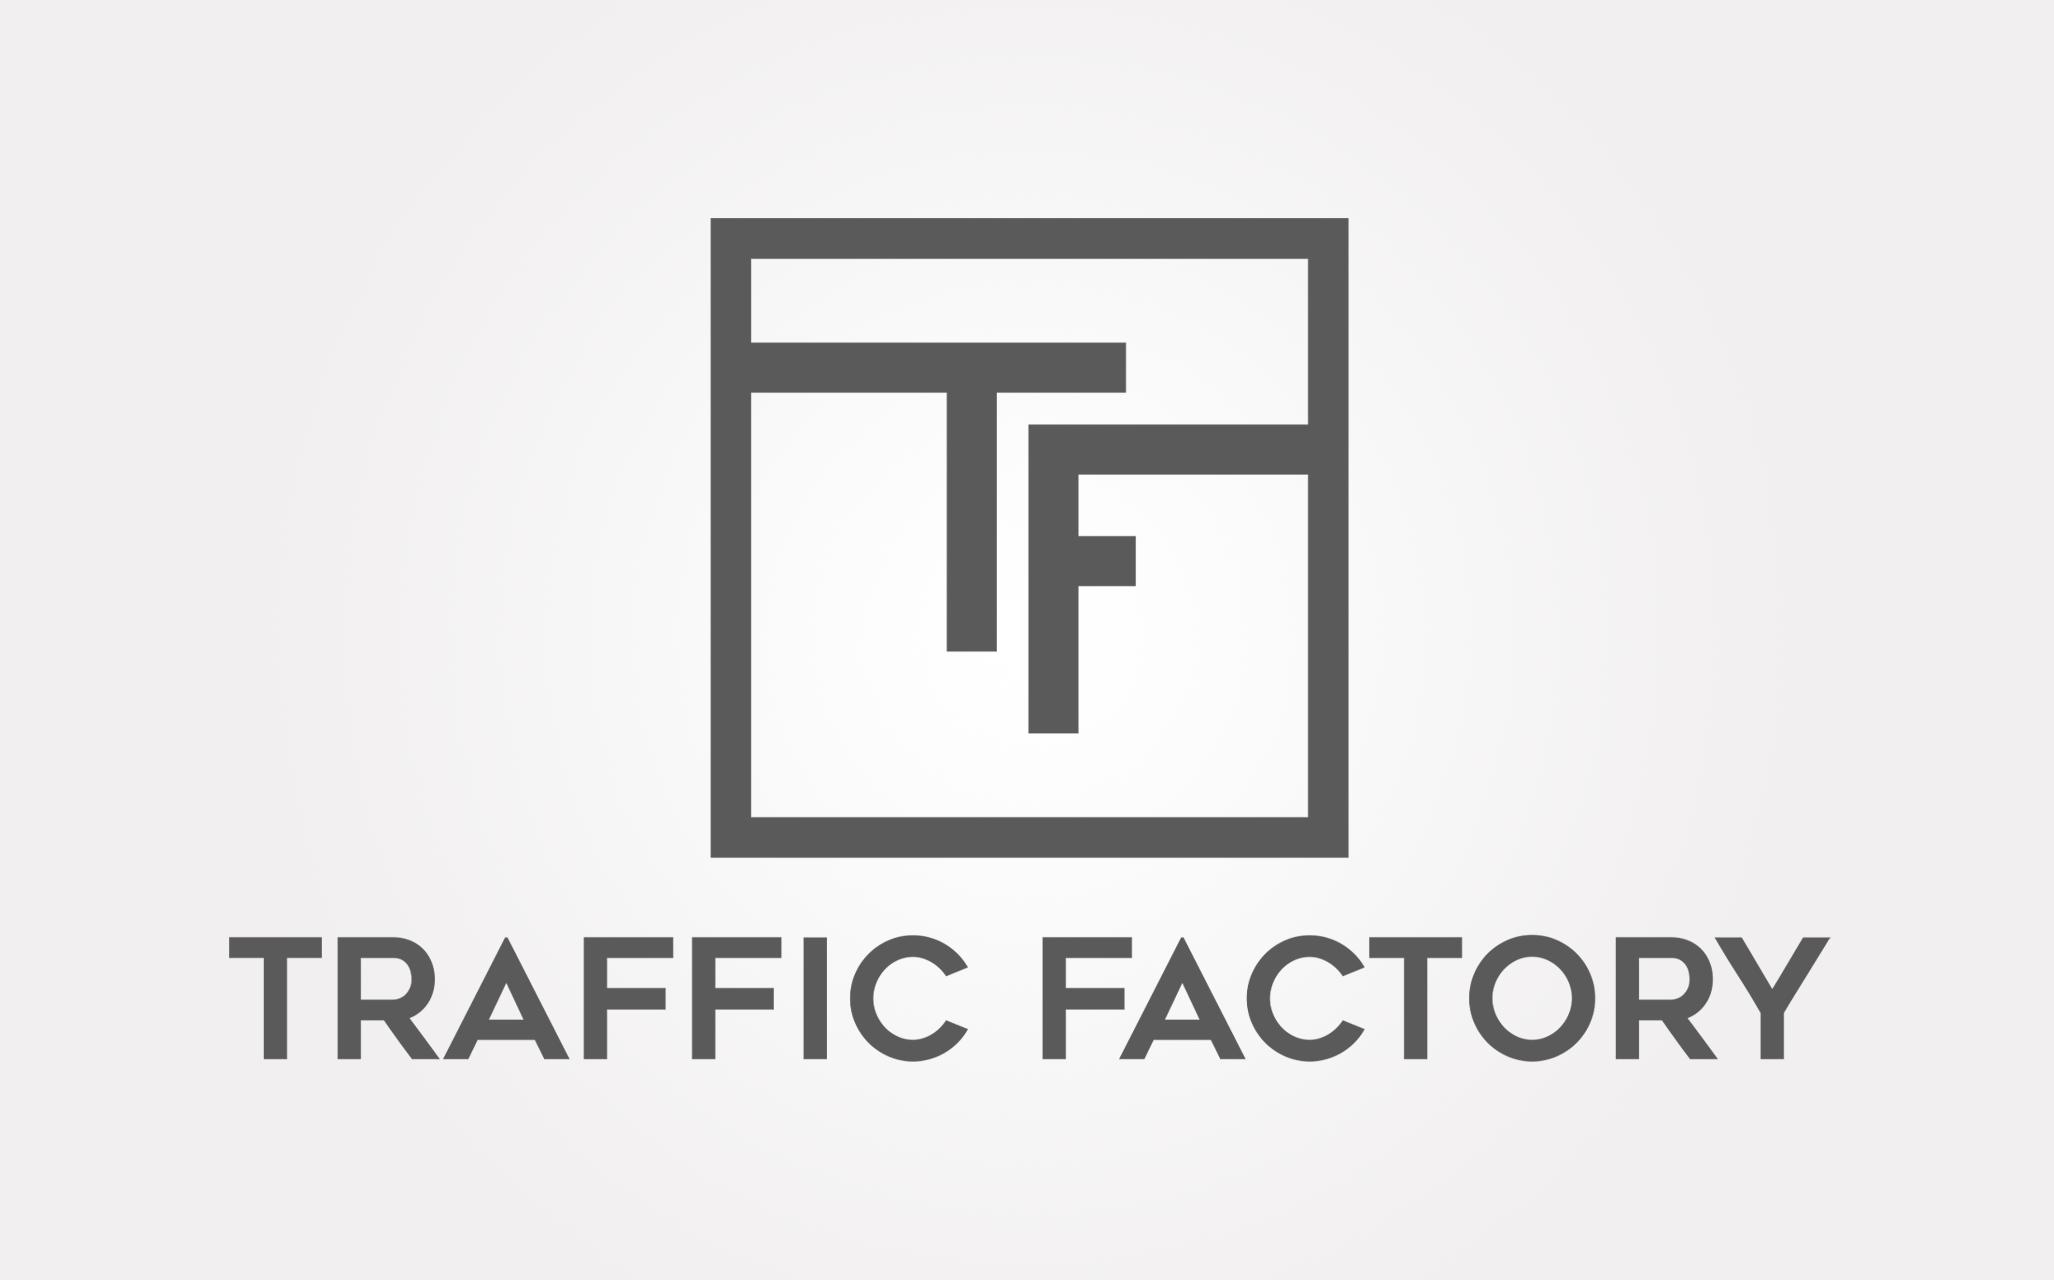 traffic-factory-logo-2.png